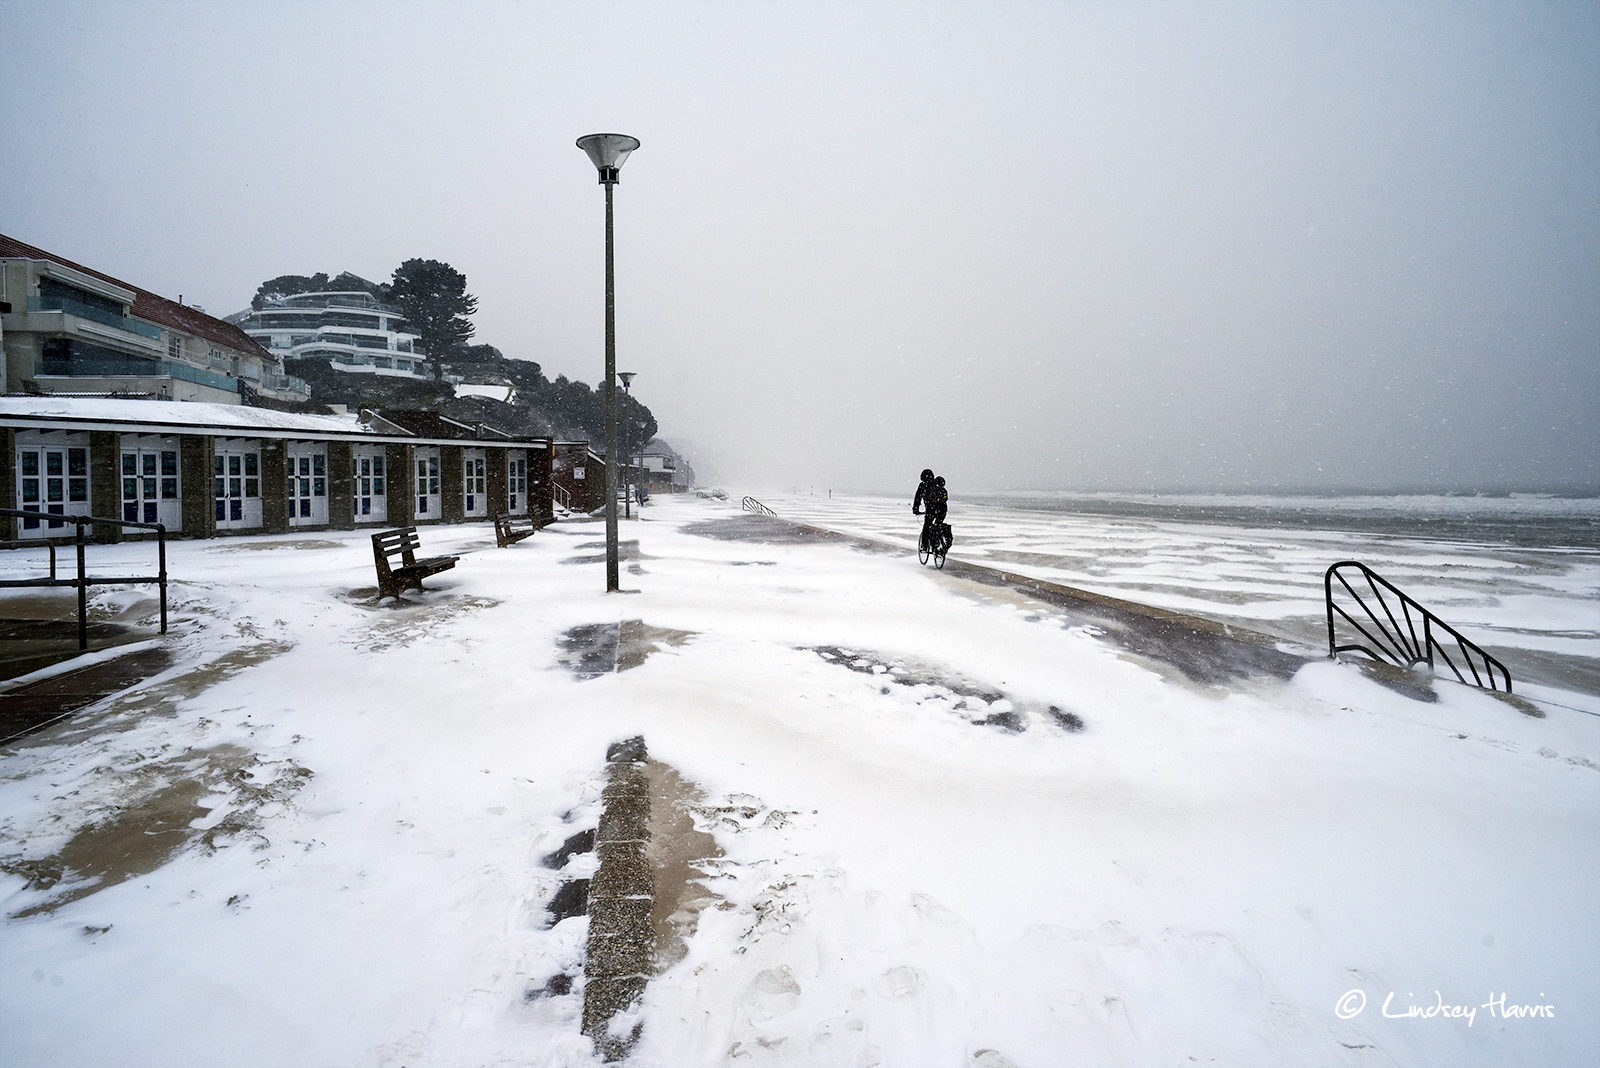 Snow at Sandbanks, Poole, Dorset. 1st March 2018.